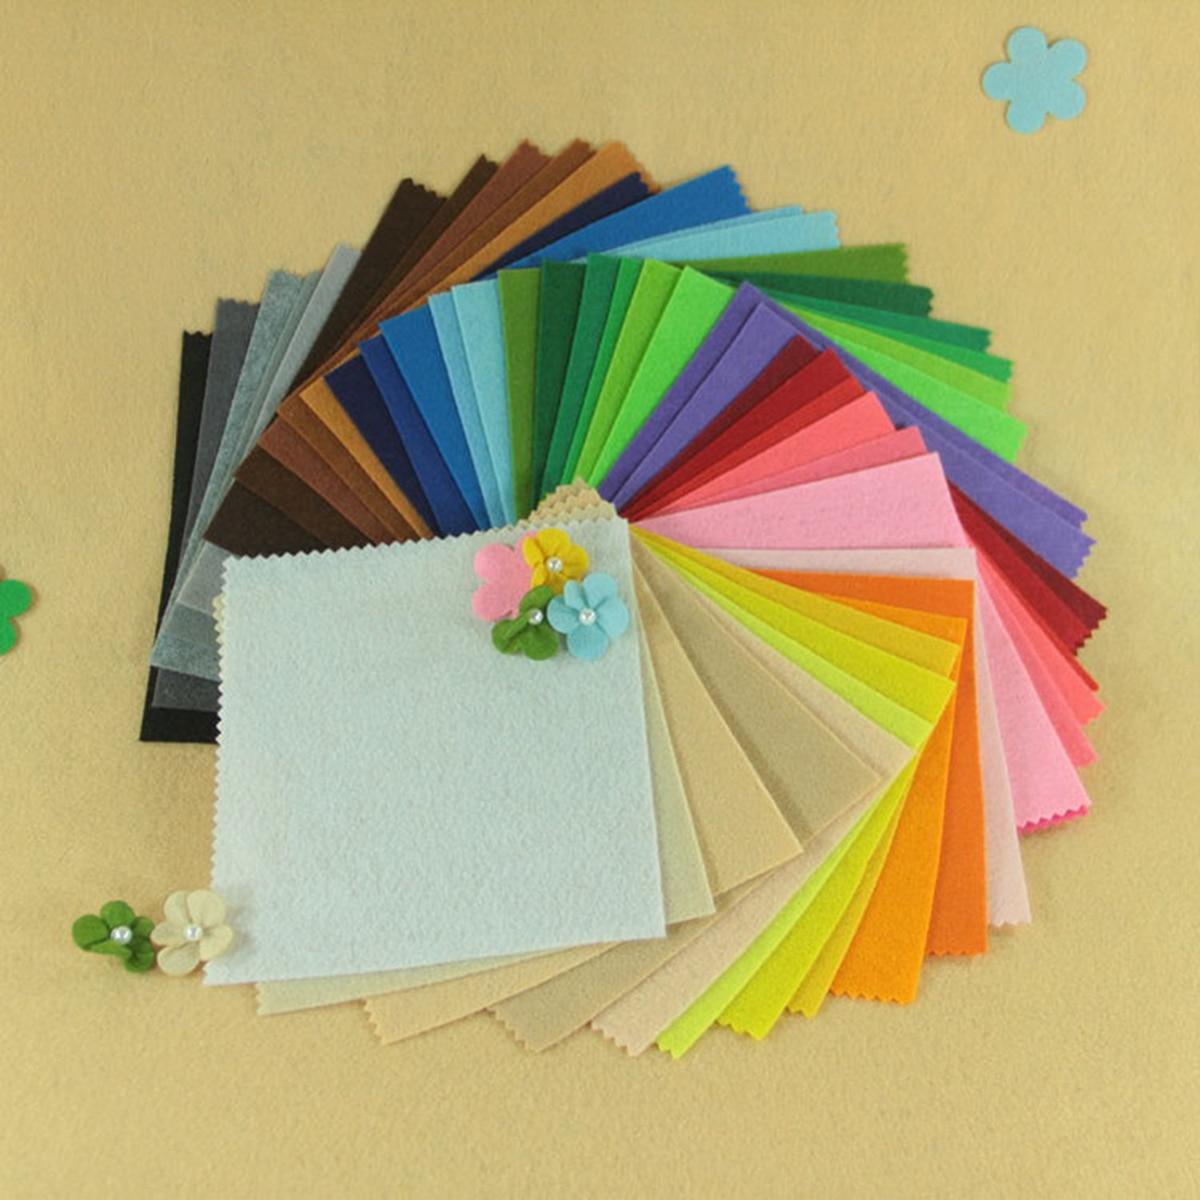 2019 Colorful Crafts Felt Fabric 1mm Thickness Felt Sheets Rainbow